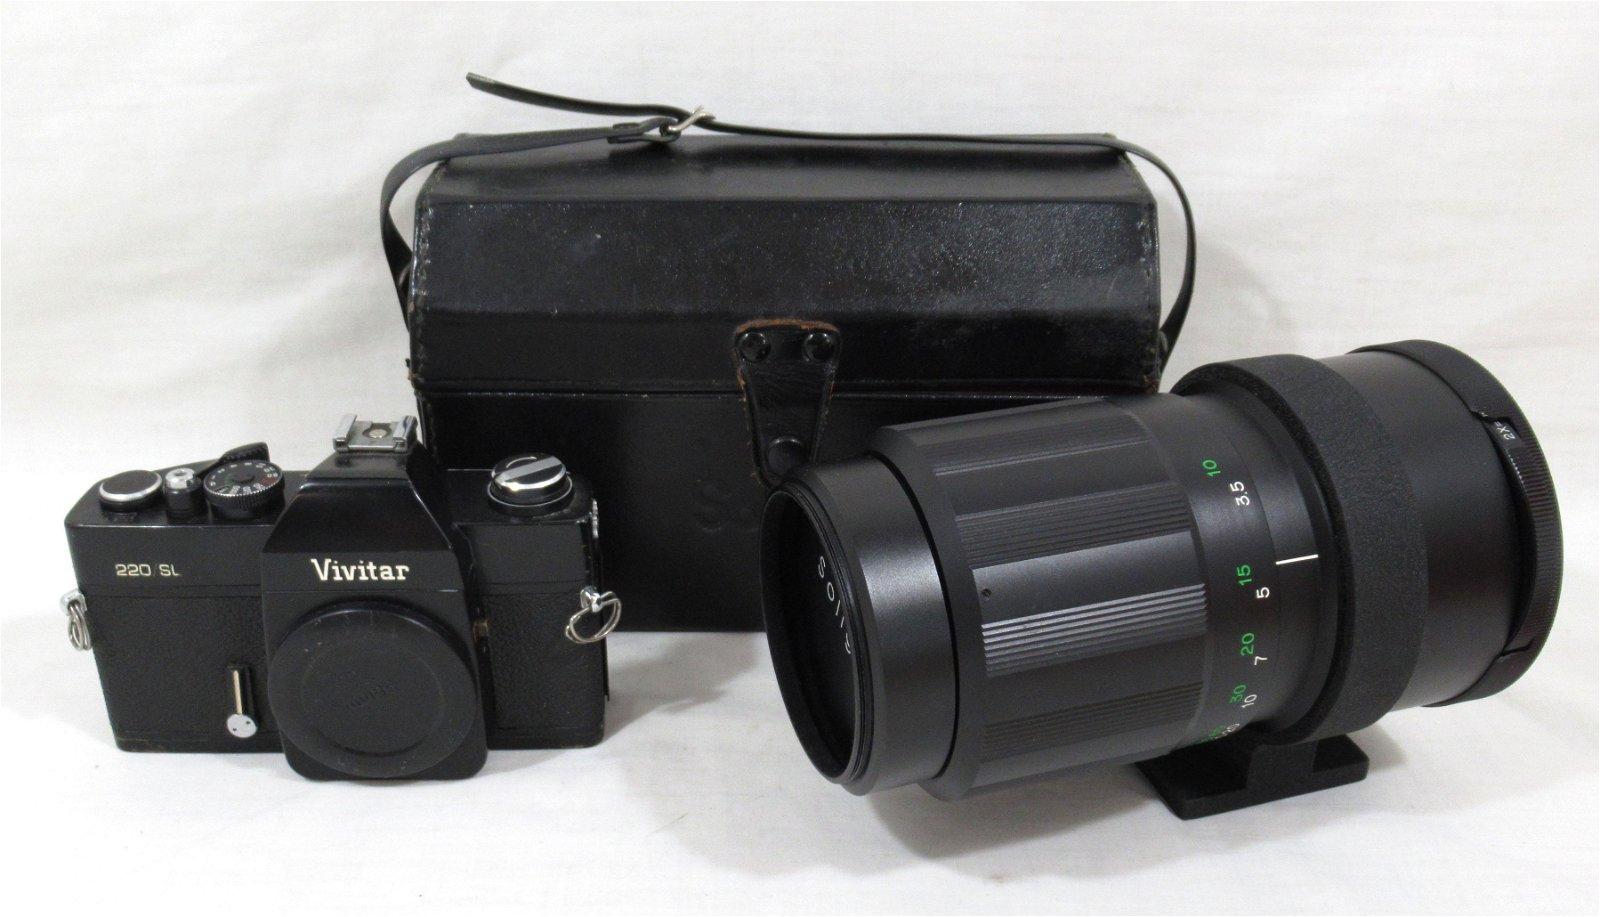 Vivitar 220/SL Single Lens Reflex Camera